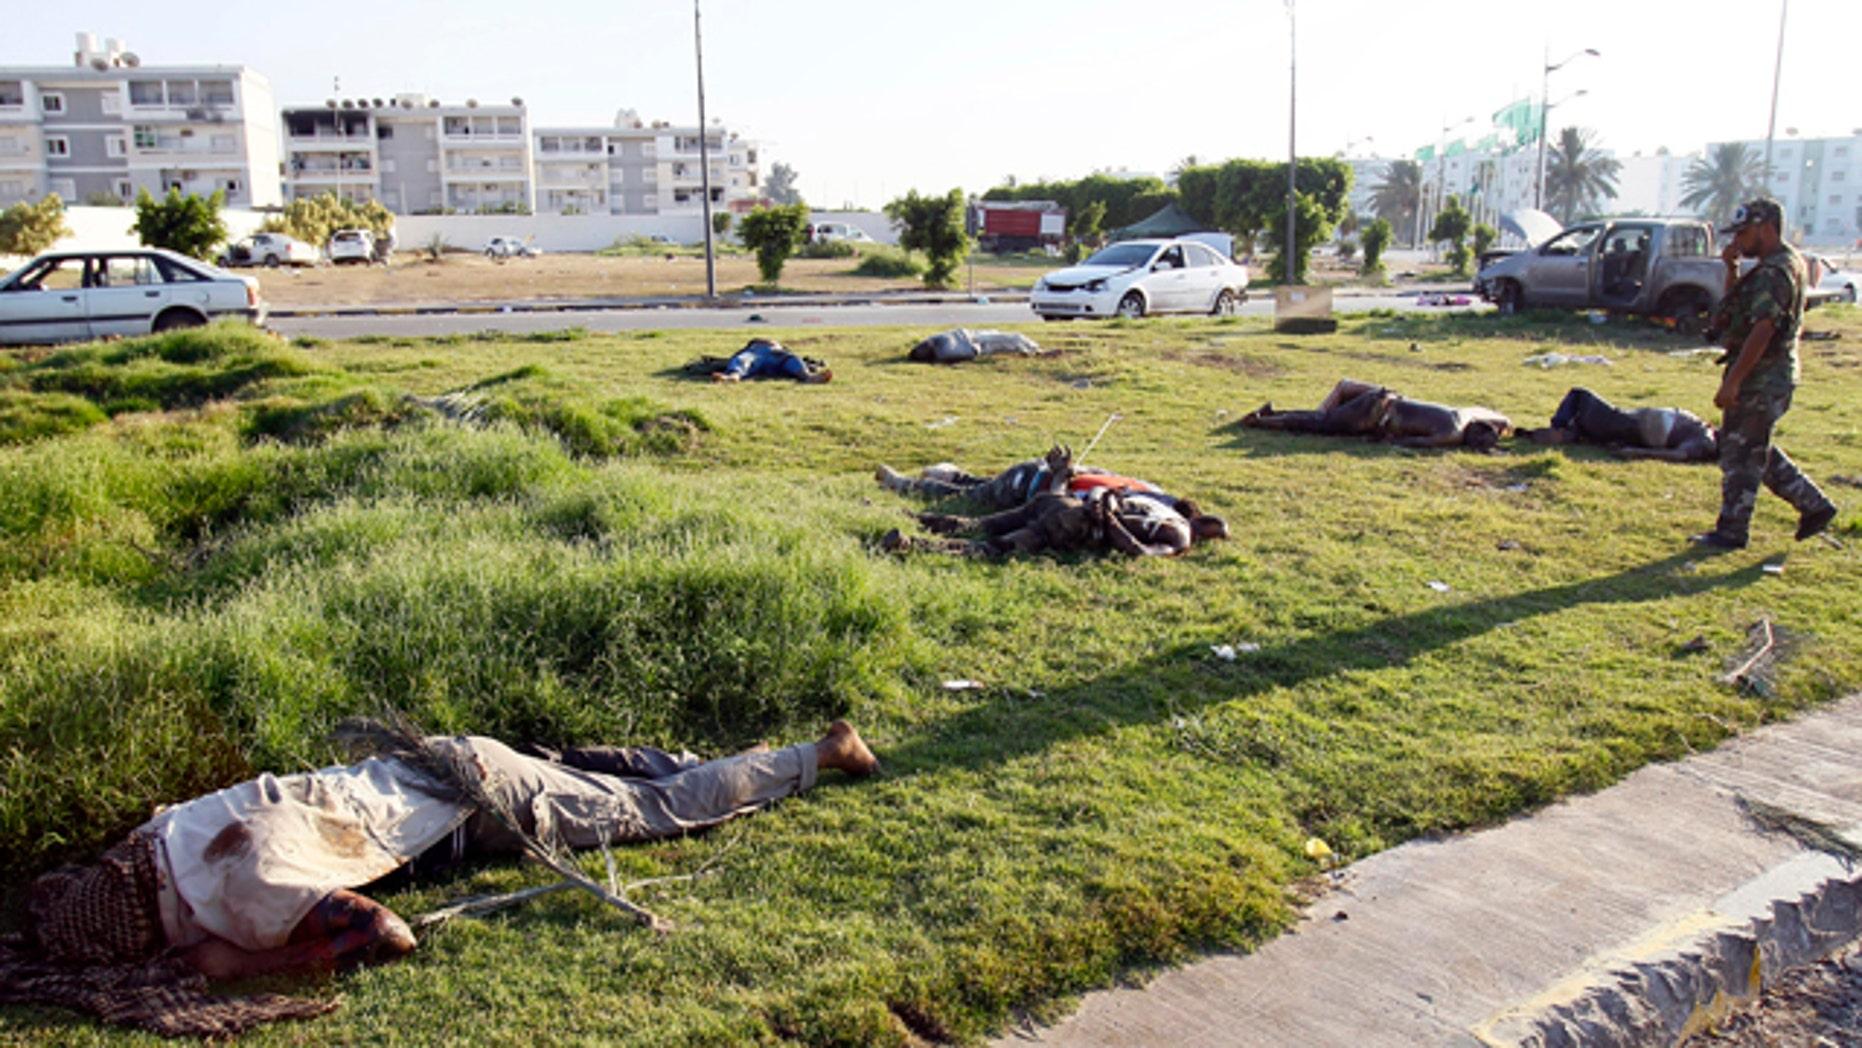 Aug. 25: Libyan rebel walks by dead bodies in Abu Salim district in Tripoli, Libya.